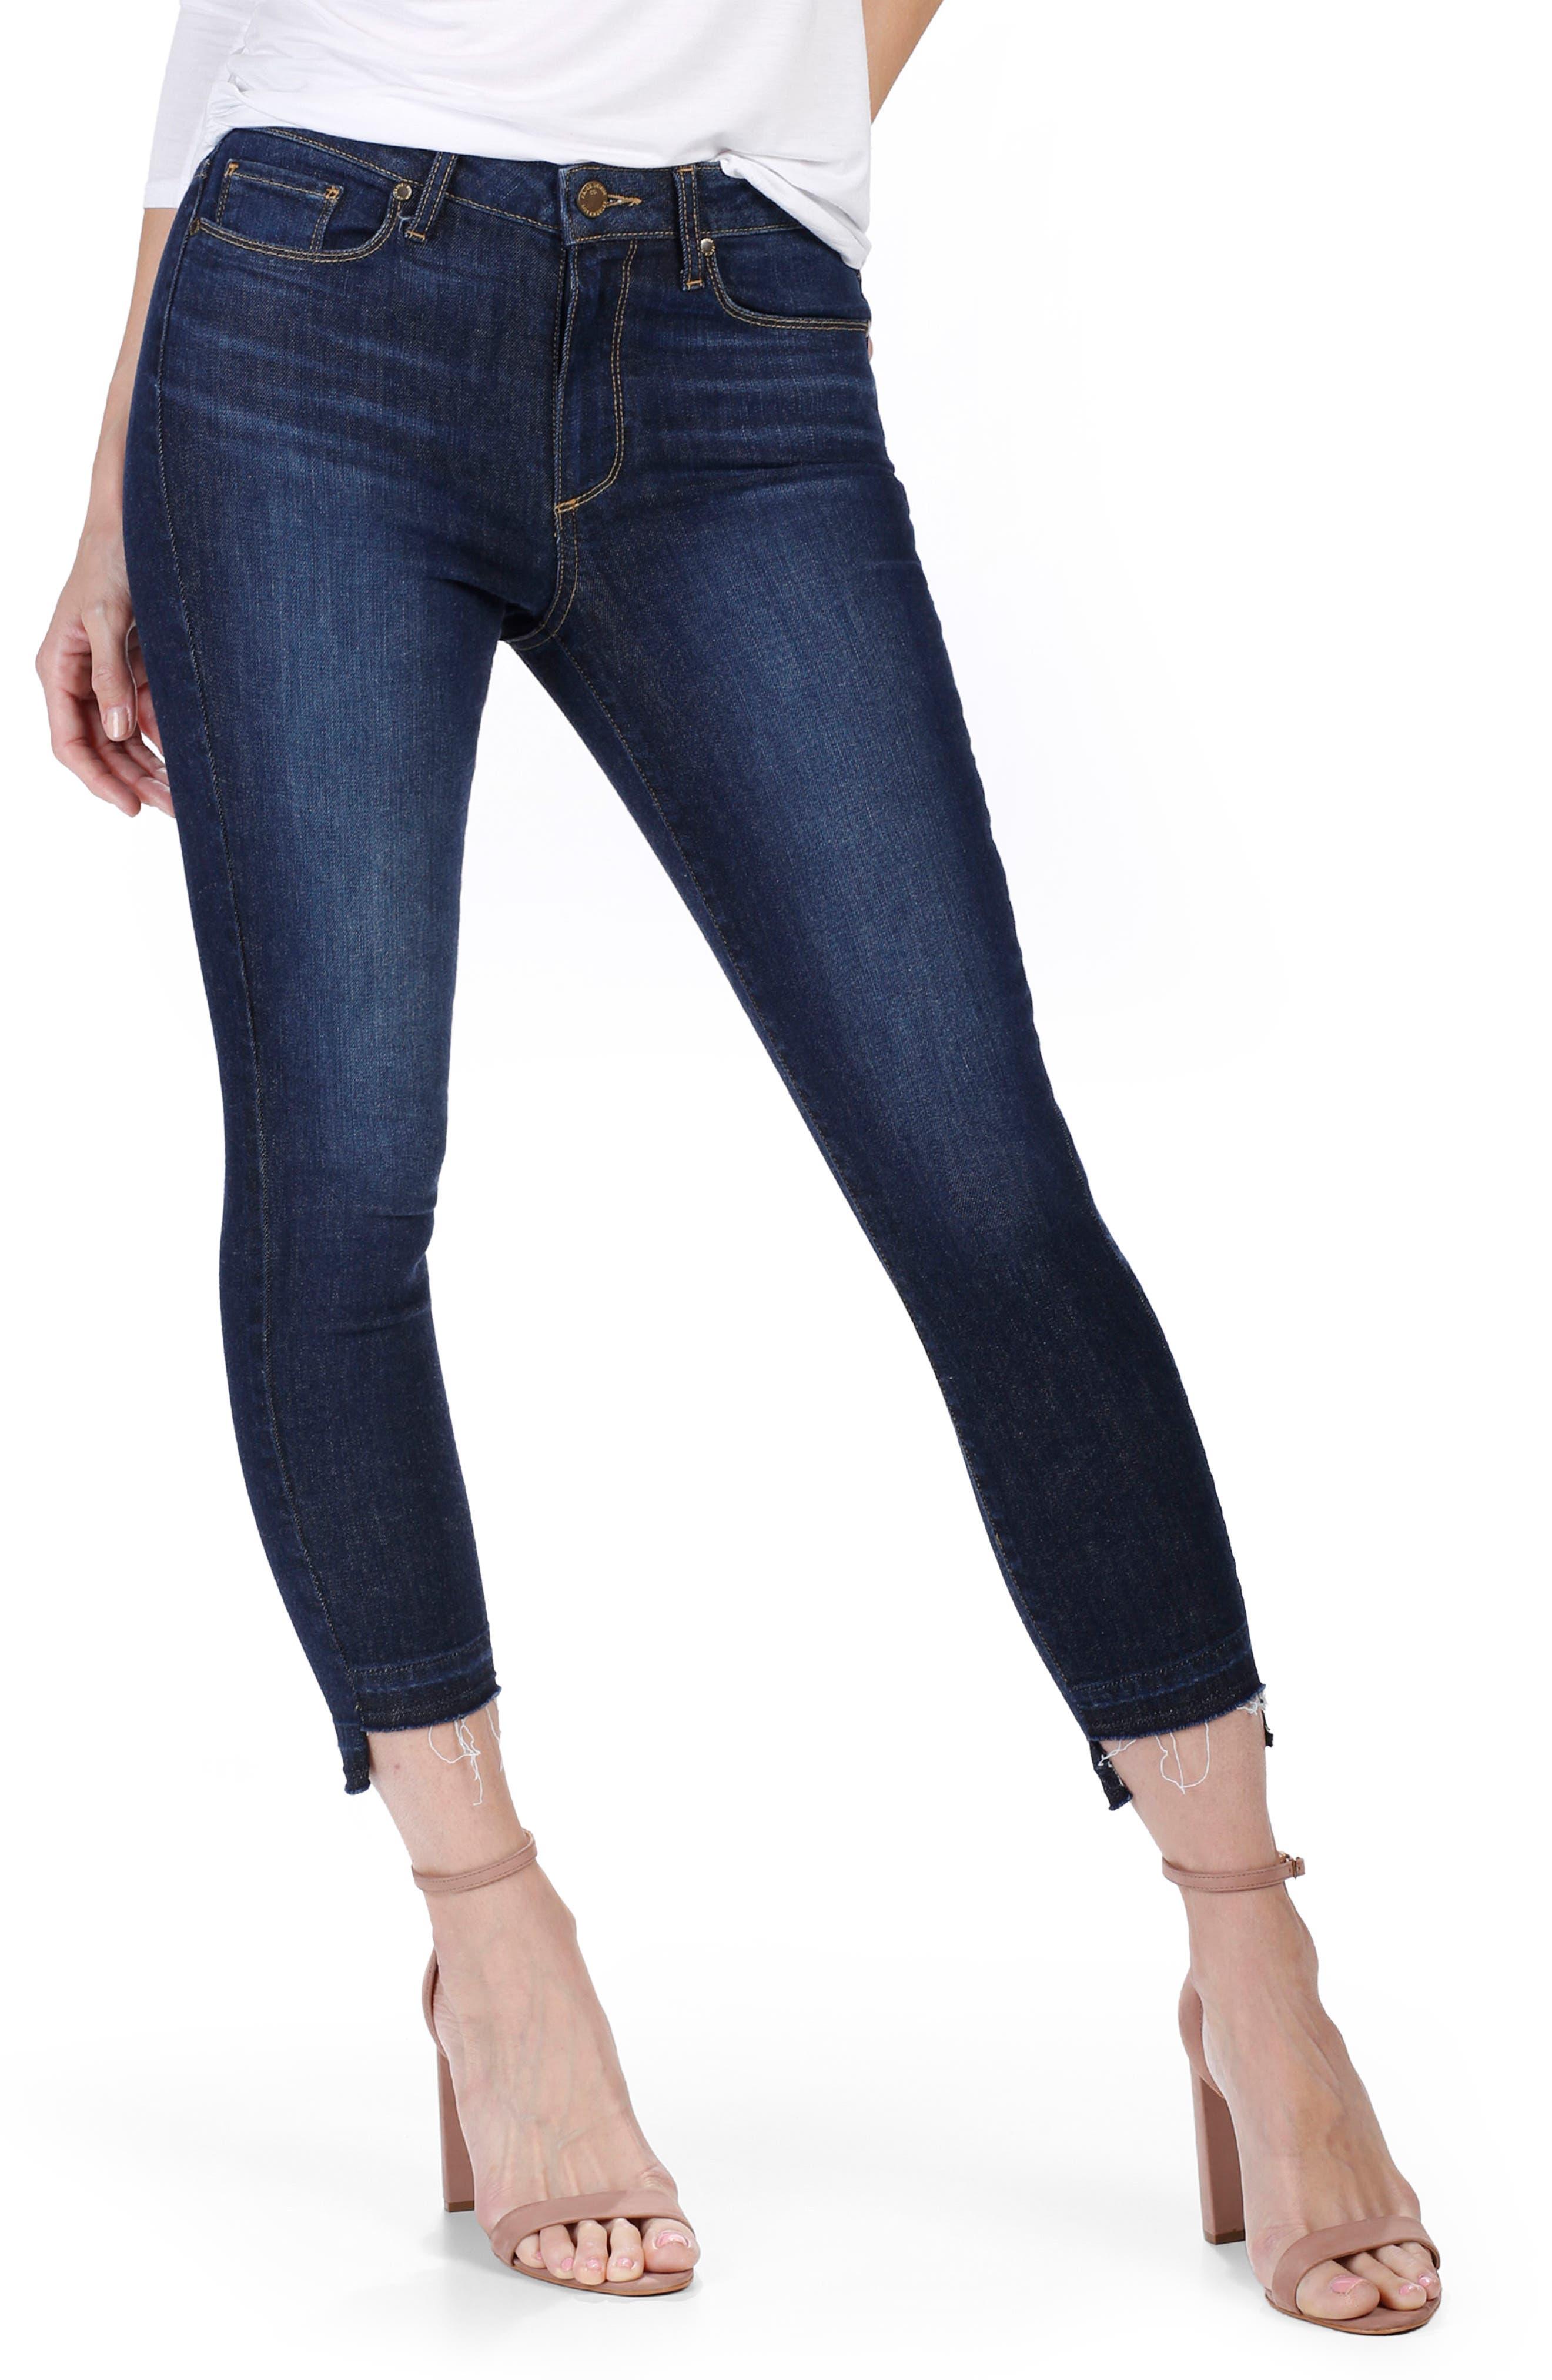 Hoxton High Waist Crop Ultra Skinny Jeans,                         Main,                         color, 400